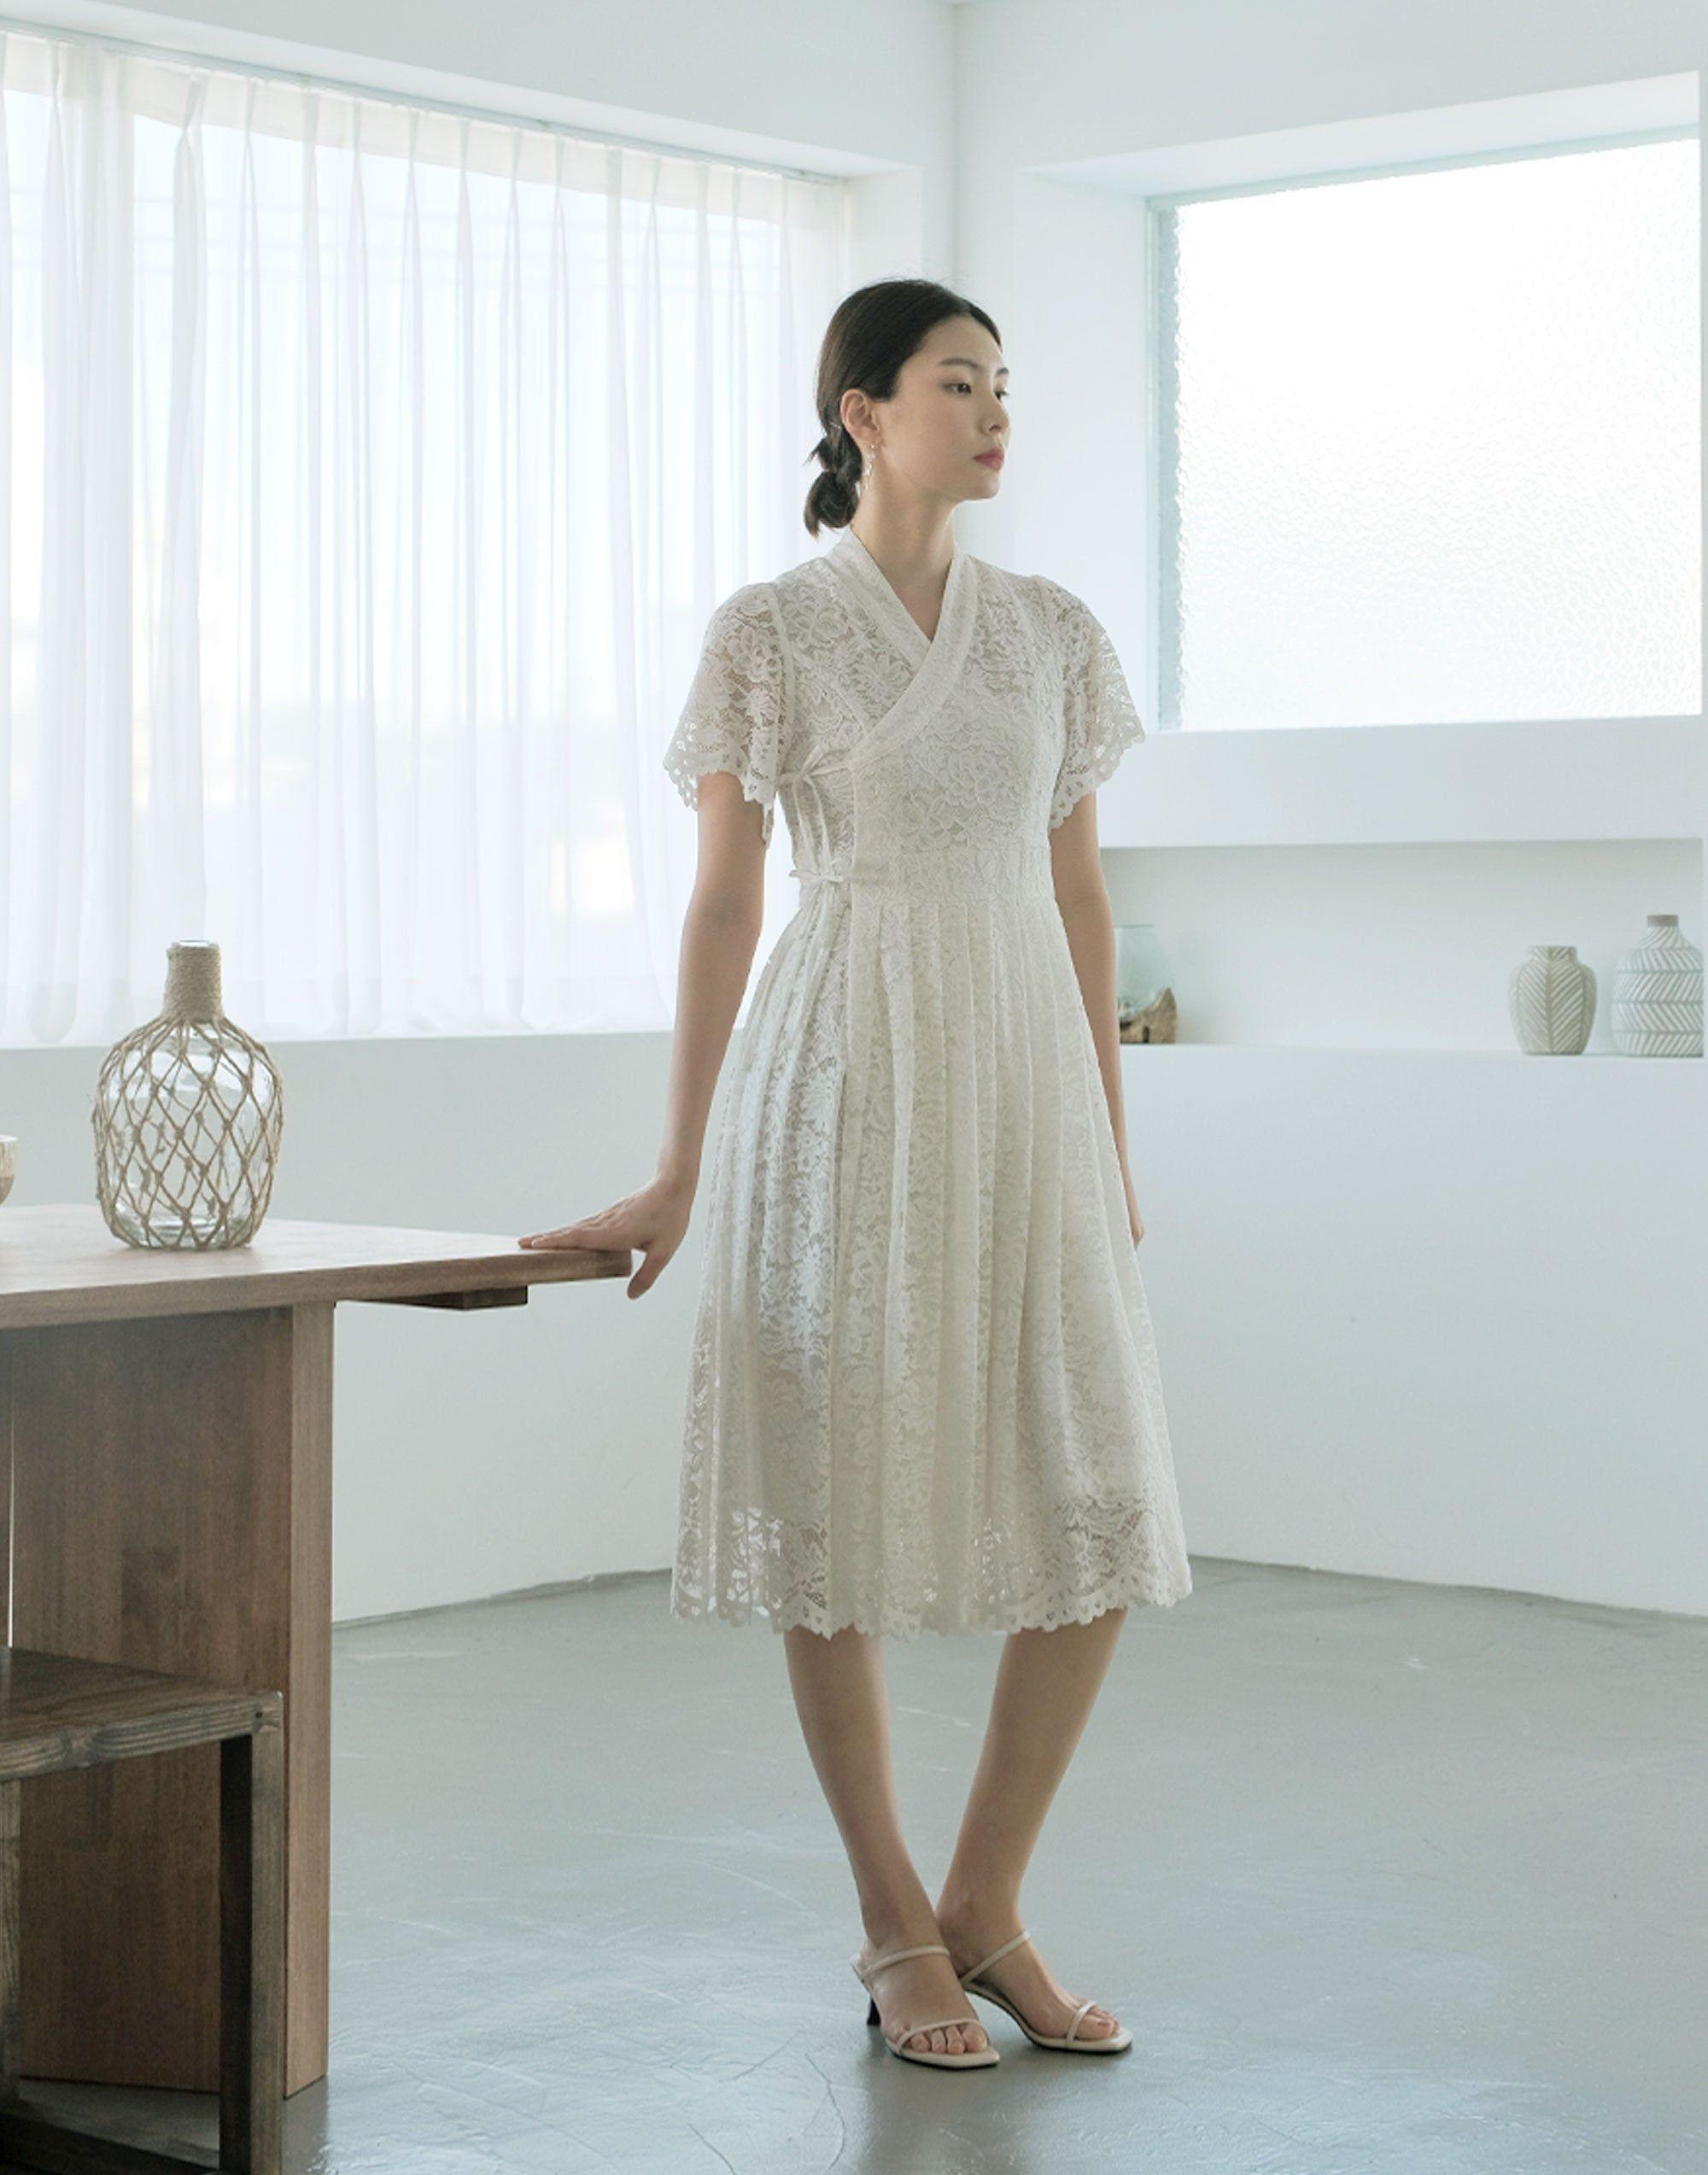 Women's Luxury Bridal Lace Long Dress Bridal Party White   Etsy